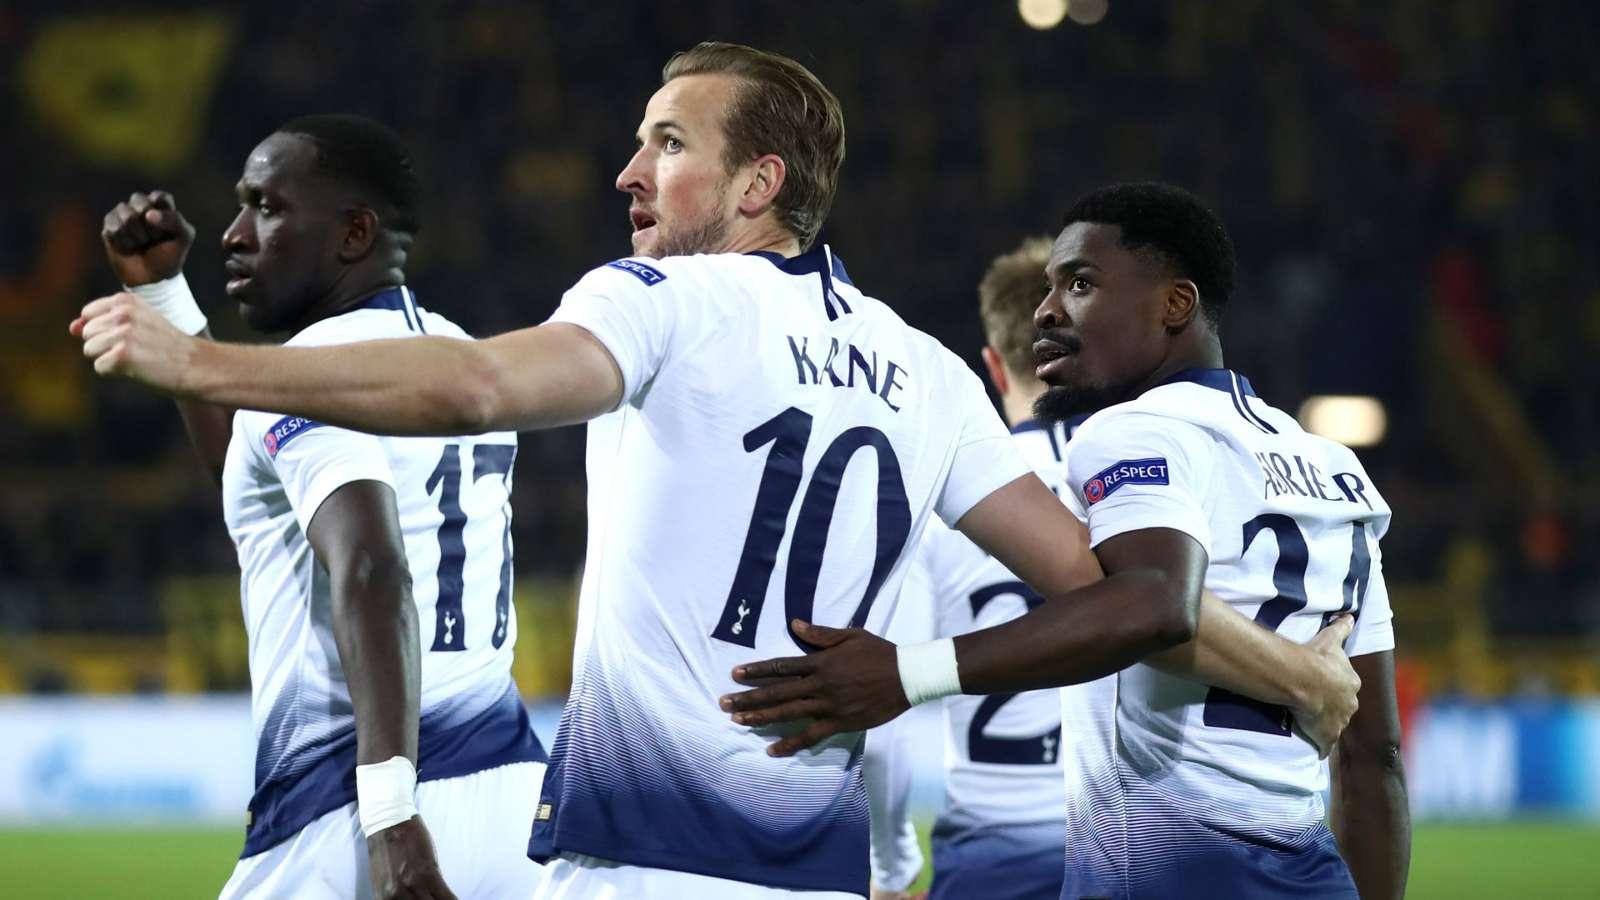 kane cropped 1uikavkl787ee1qsxmx08j8zyk - Borussia Dortmund vs Tottenham 0-1 (0-4 agg): UEFA Champions League Report & Highlights